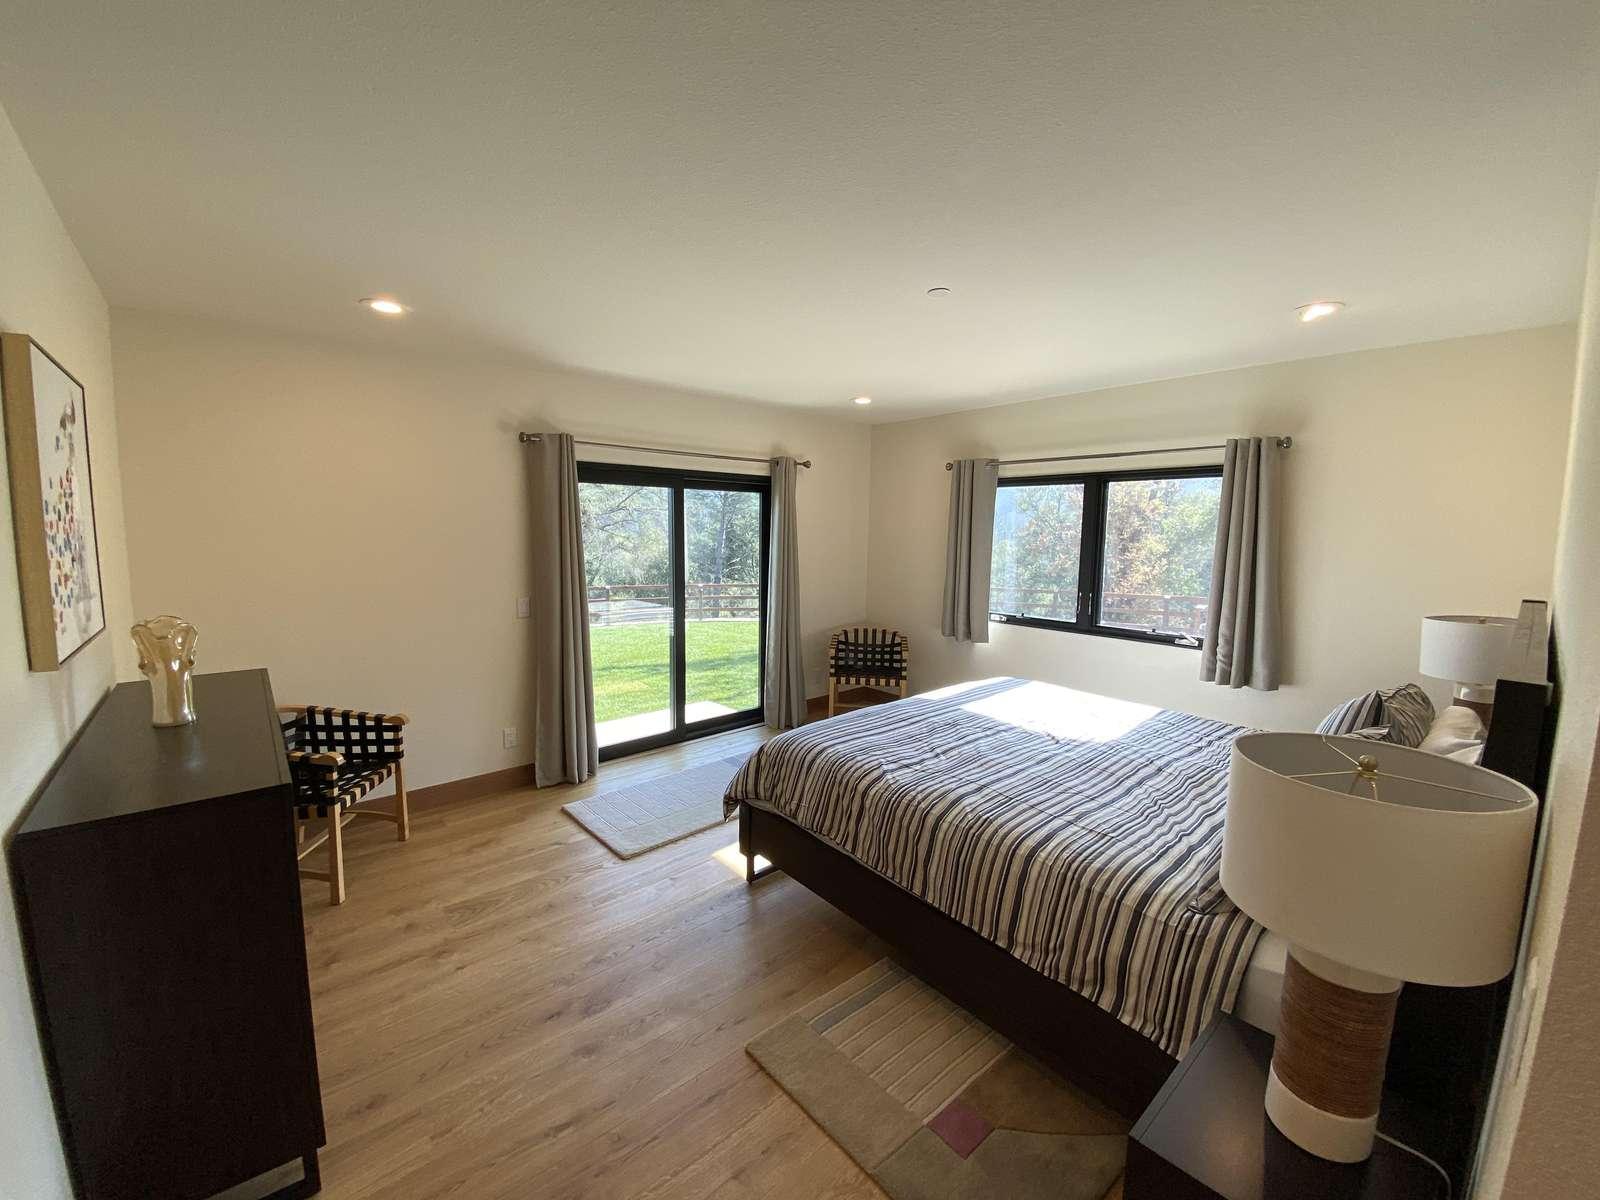 Bedroom 4: Master Suite w/ Ensuite Bath